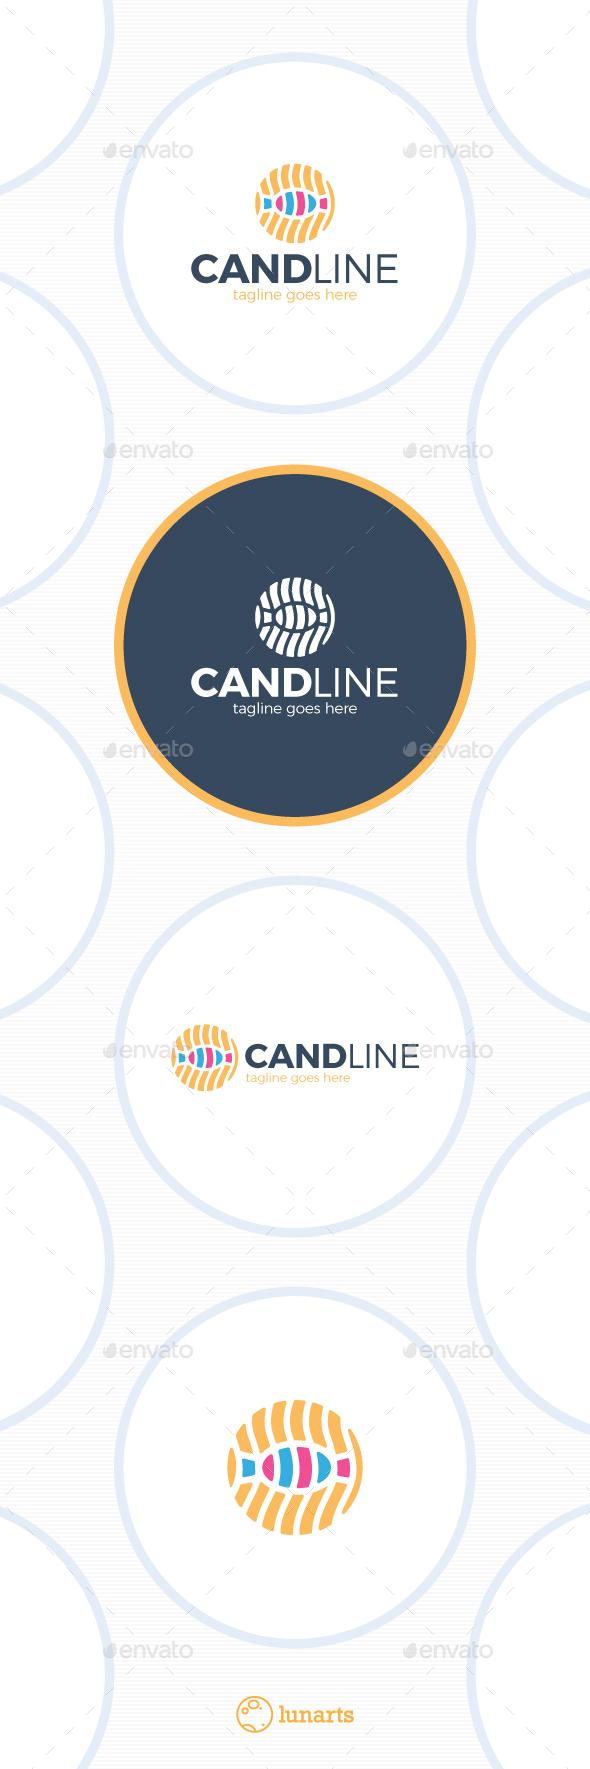 Candy Line Logo